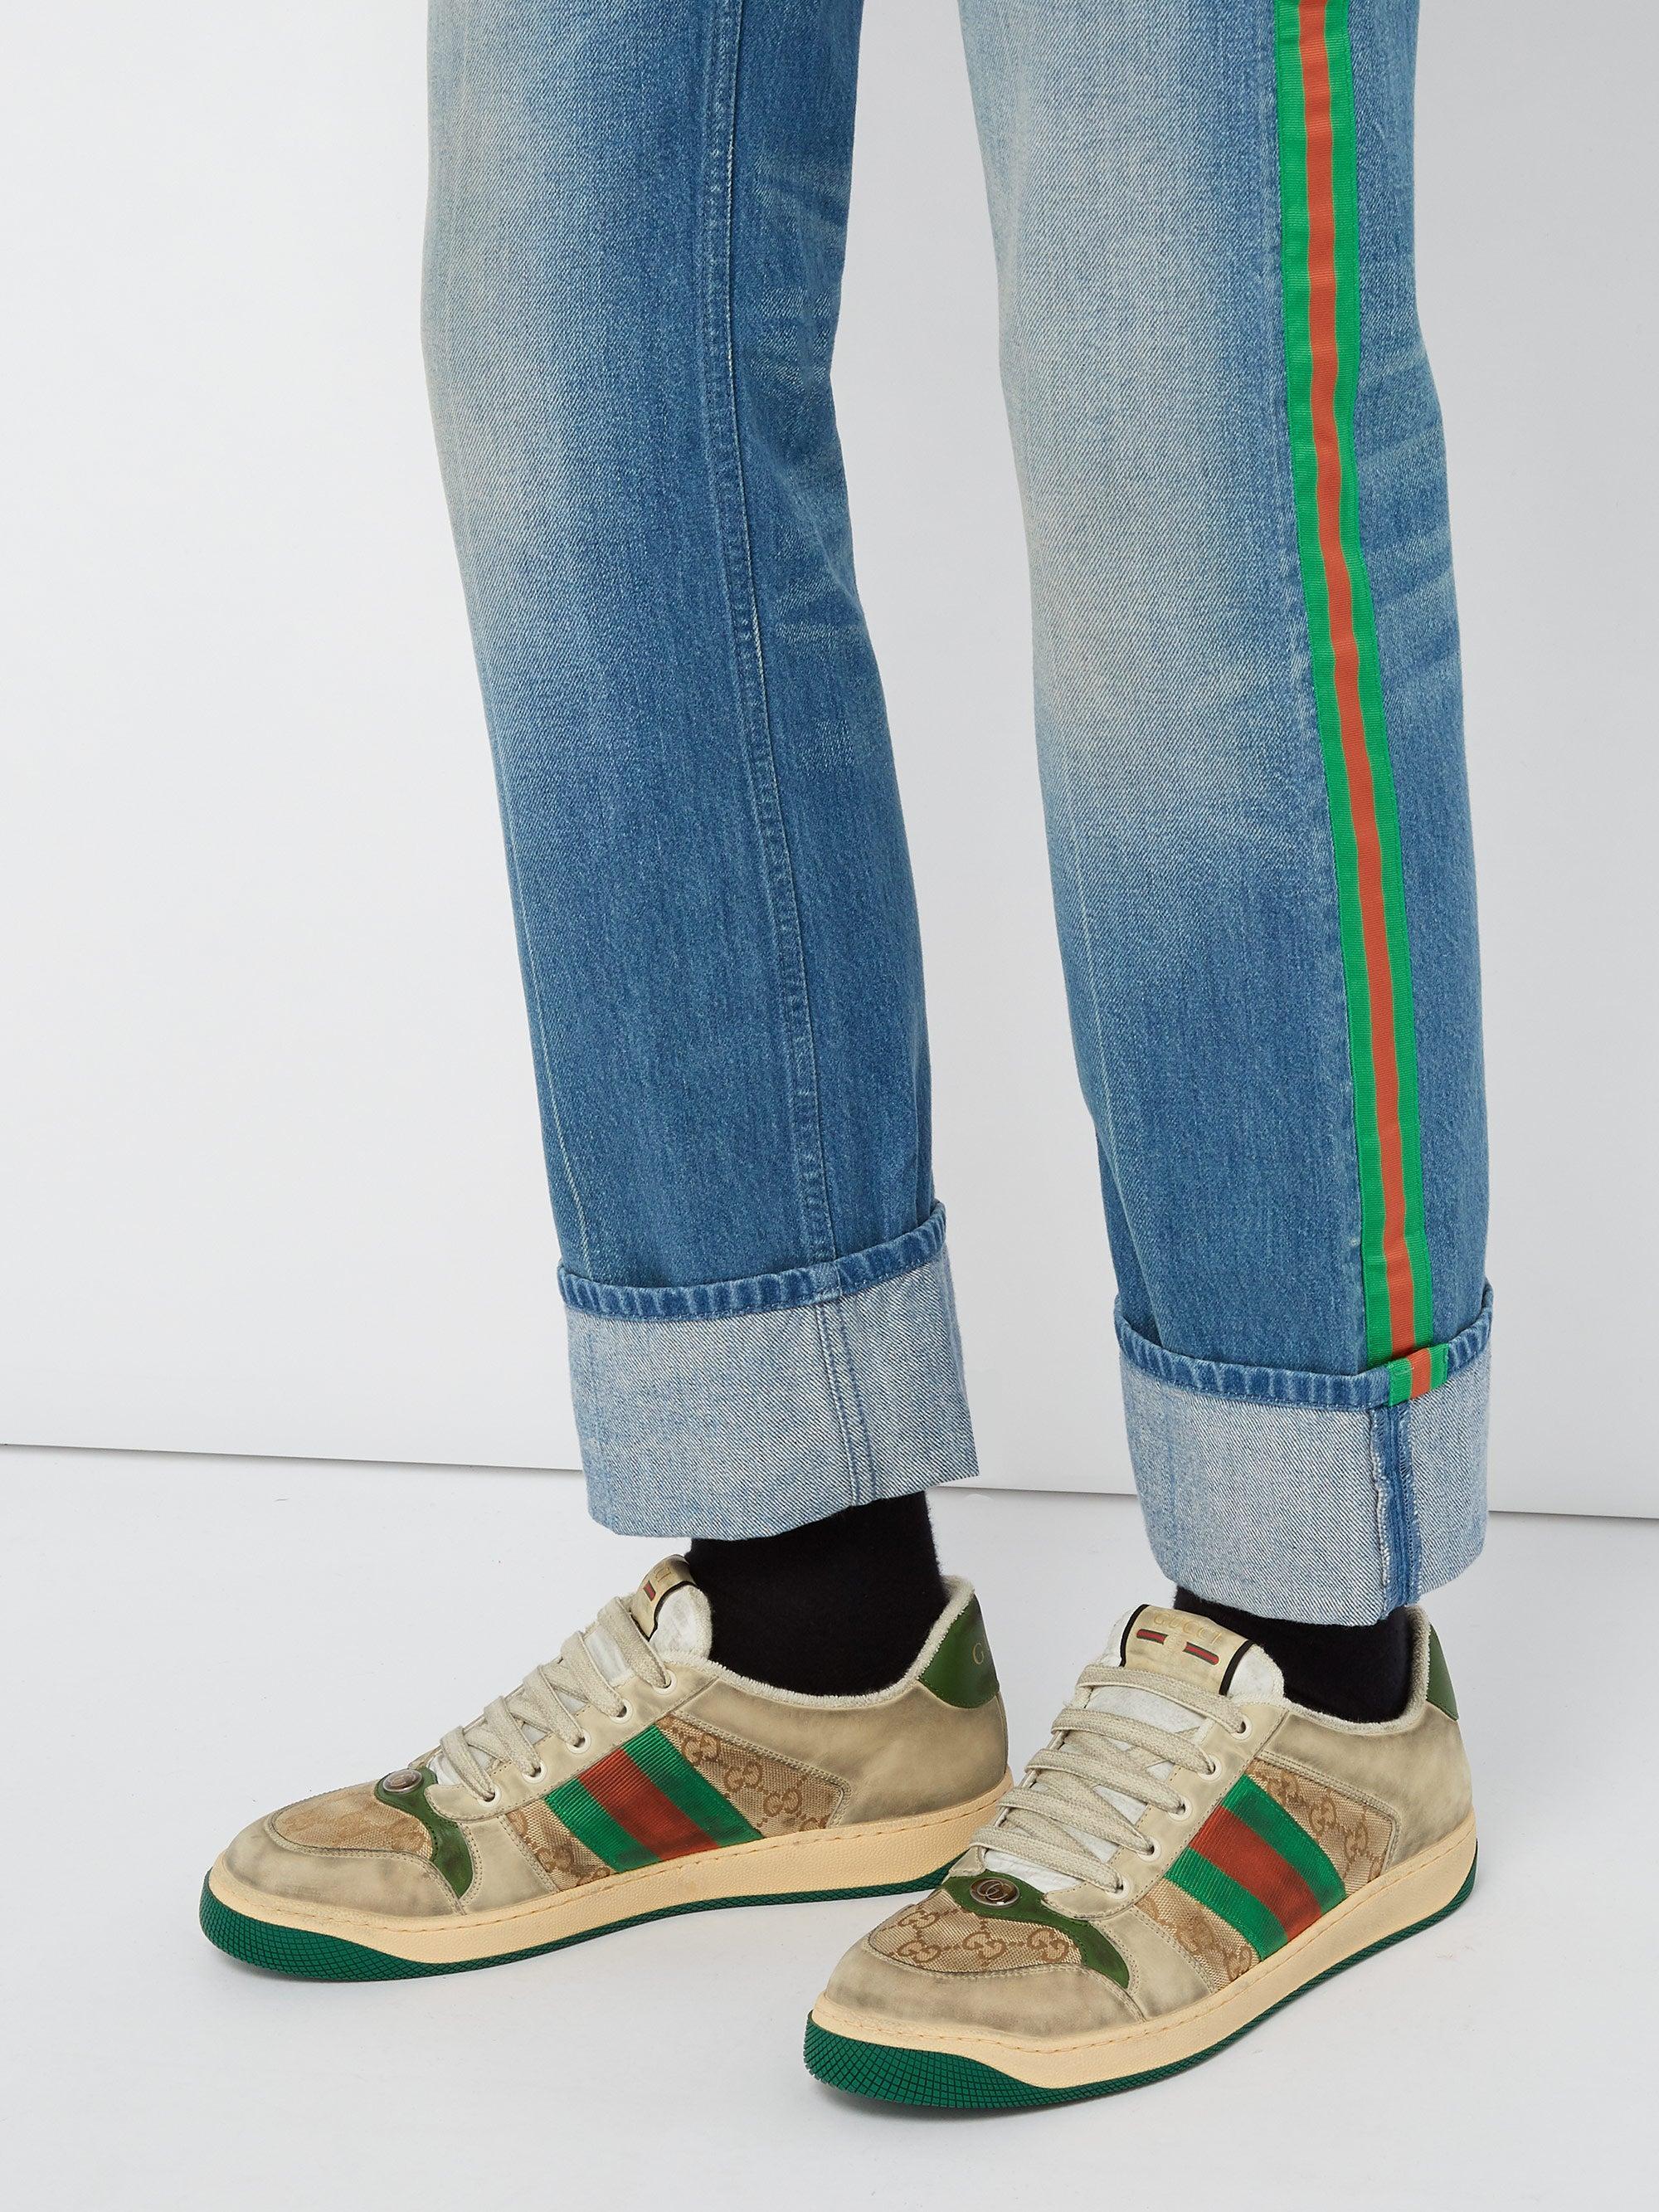 Gucci Men's Screener Leather Sneaker in